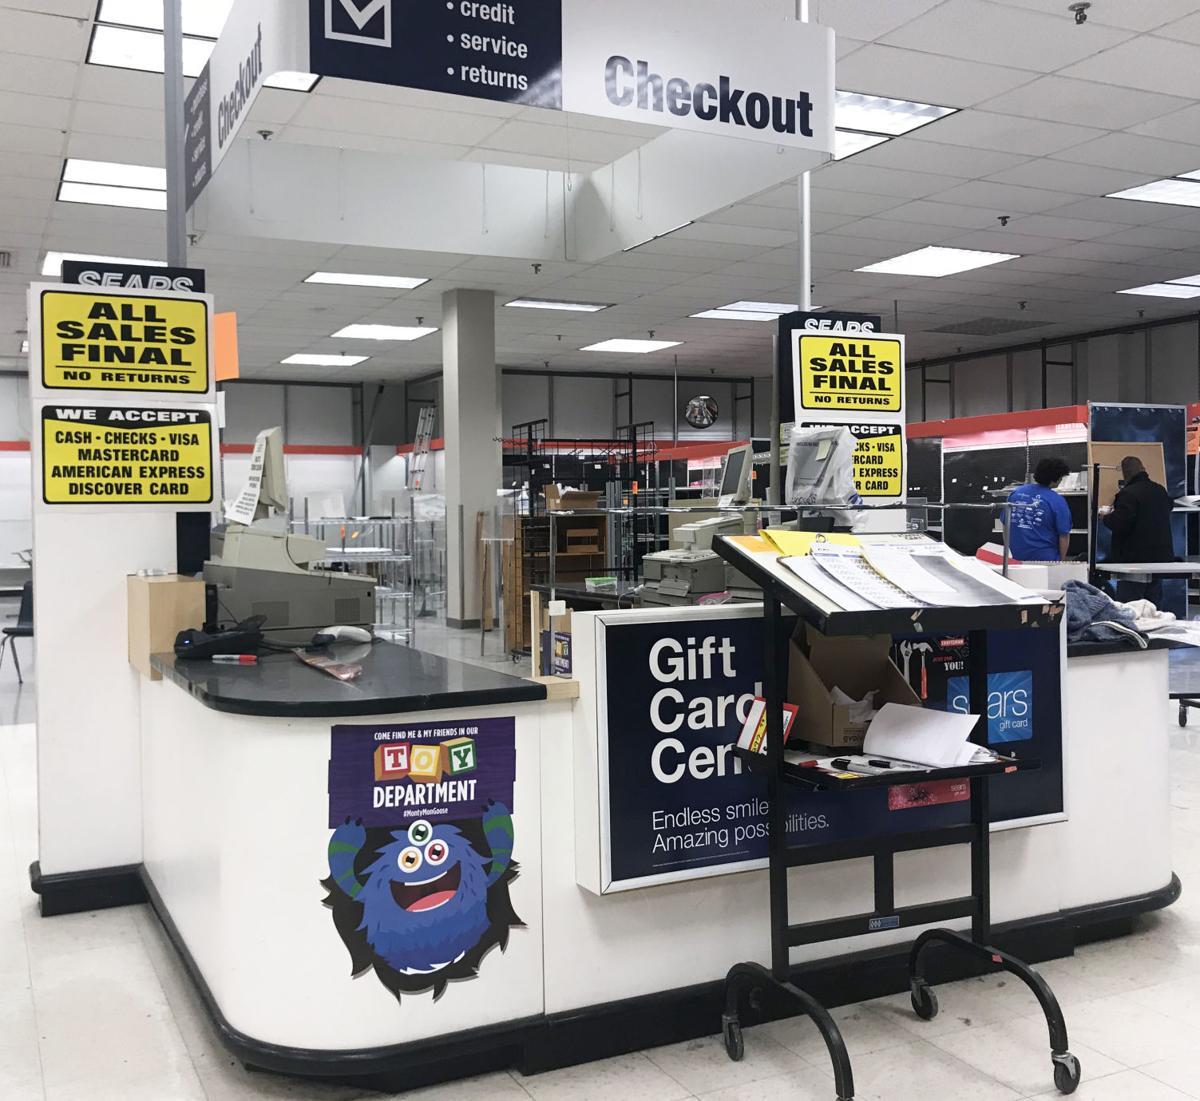 Sears_Closing_009.jpg